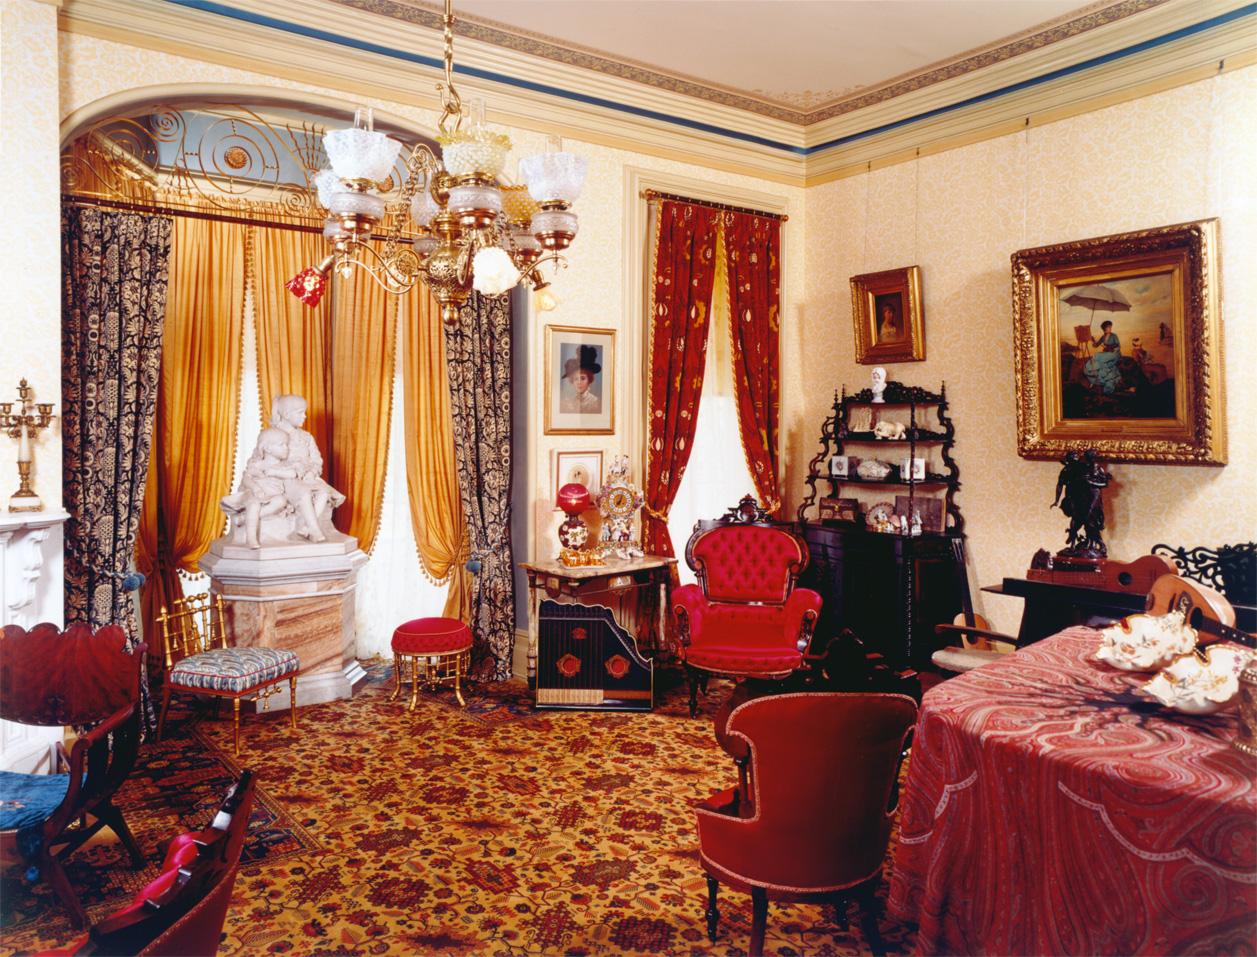 Implementation Of Historic Furnishing Plans